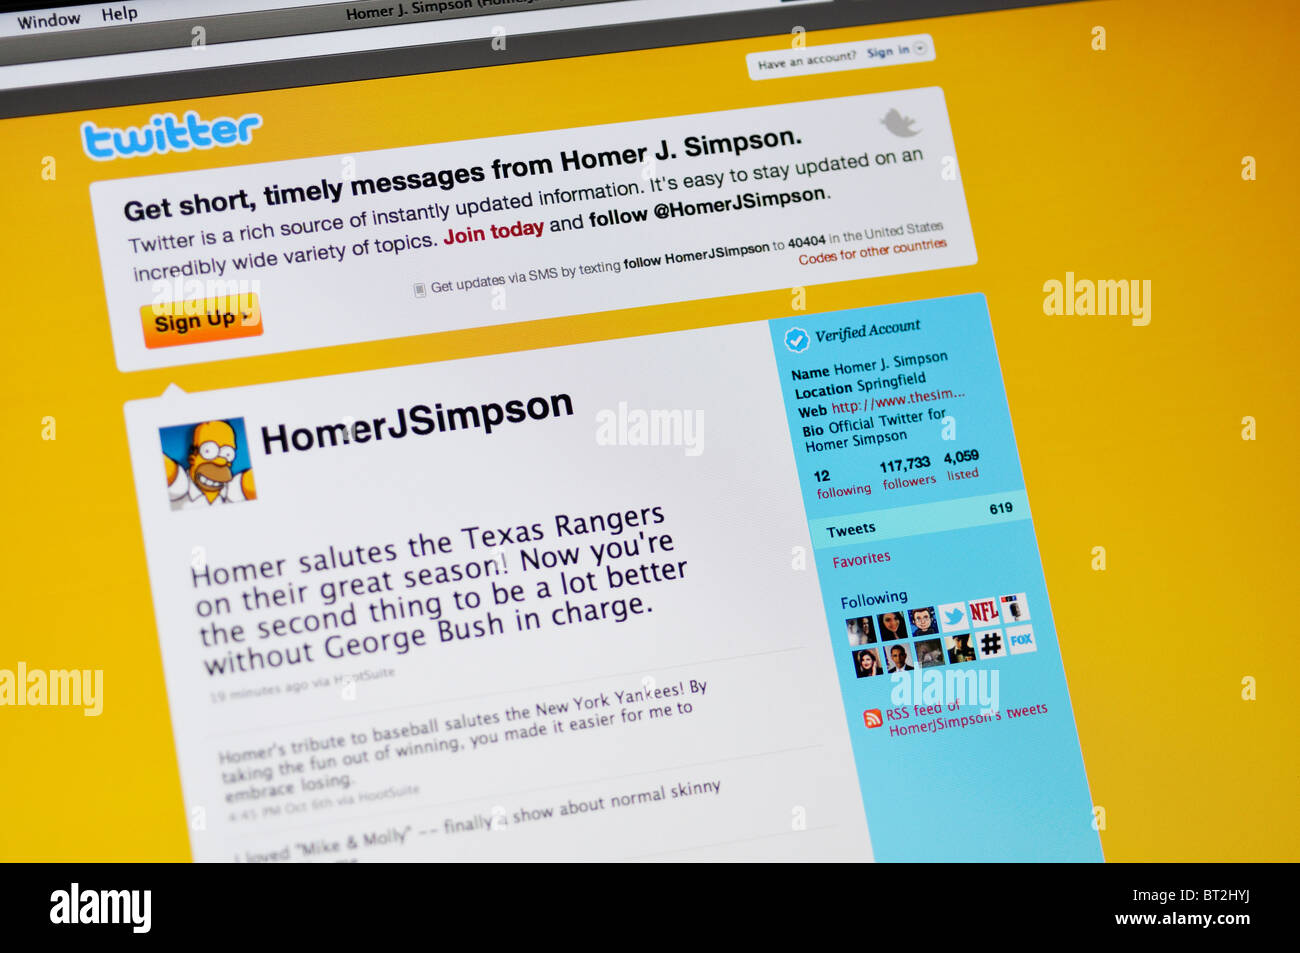 Twitter website Stock Photo: 32020118 - Alamy